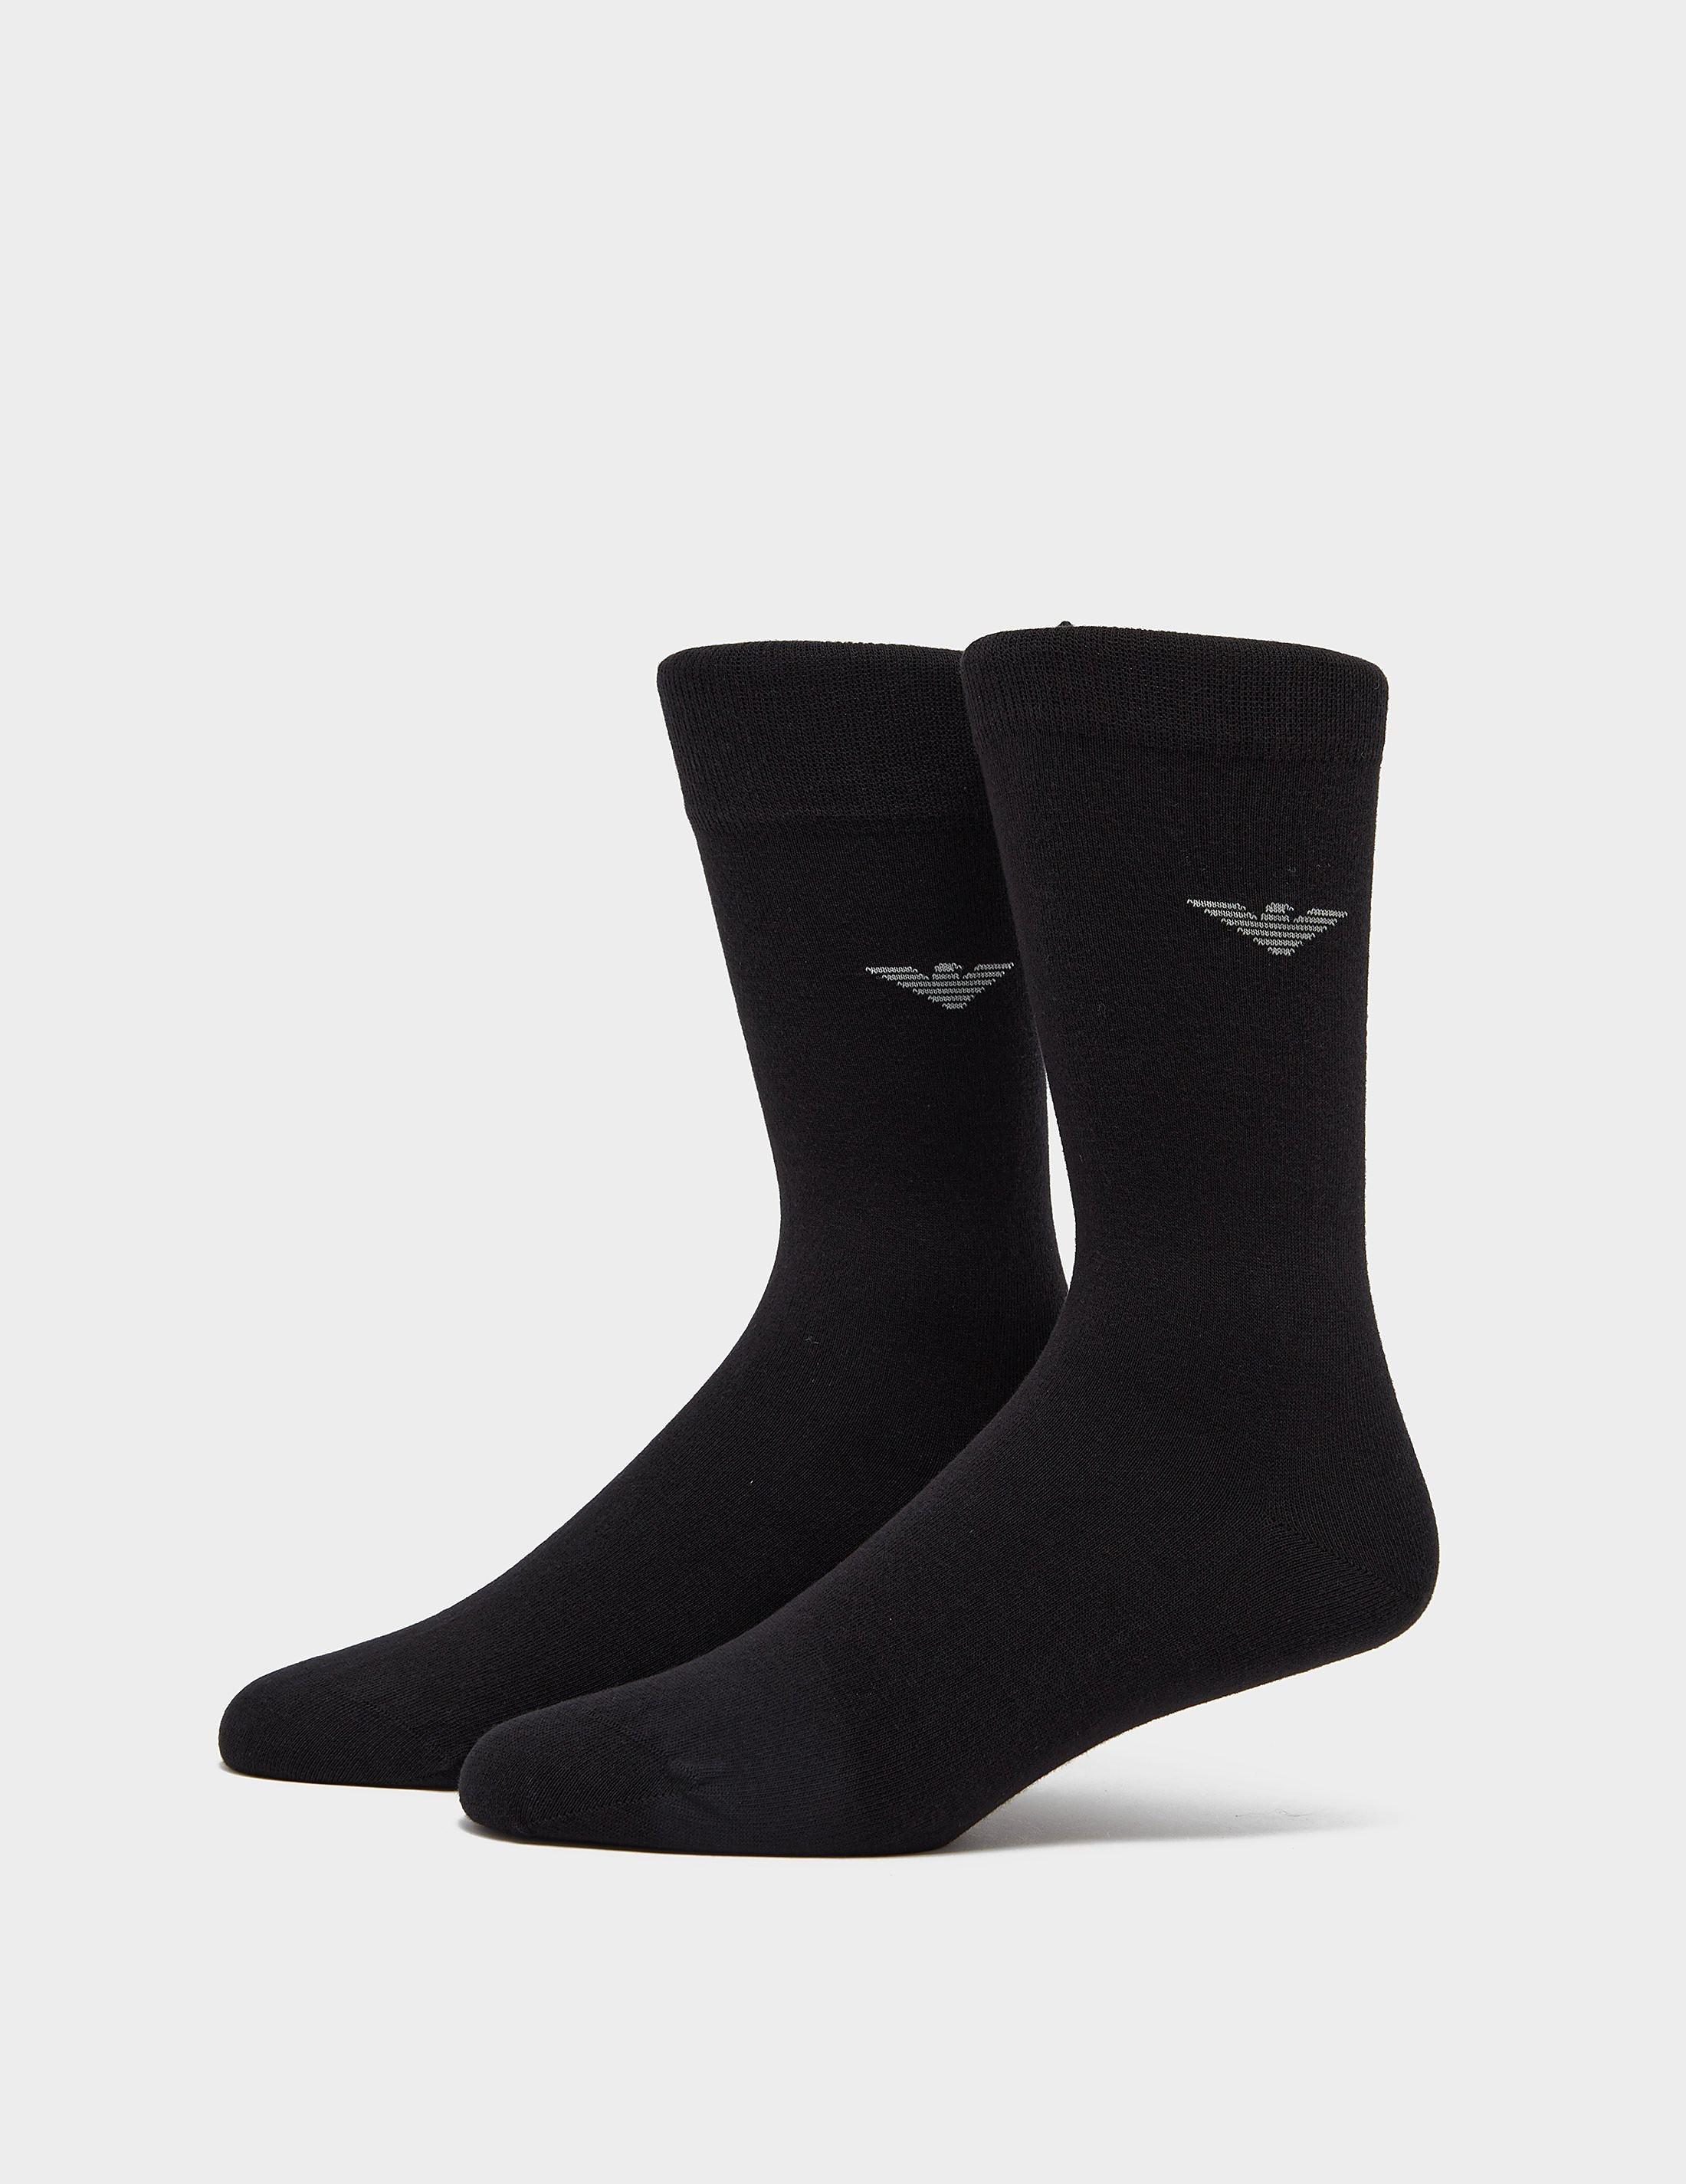 Emporio Armani 2-Pack Socks